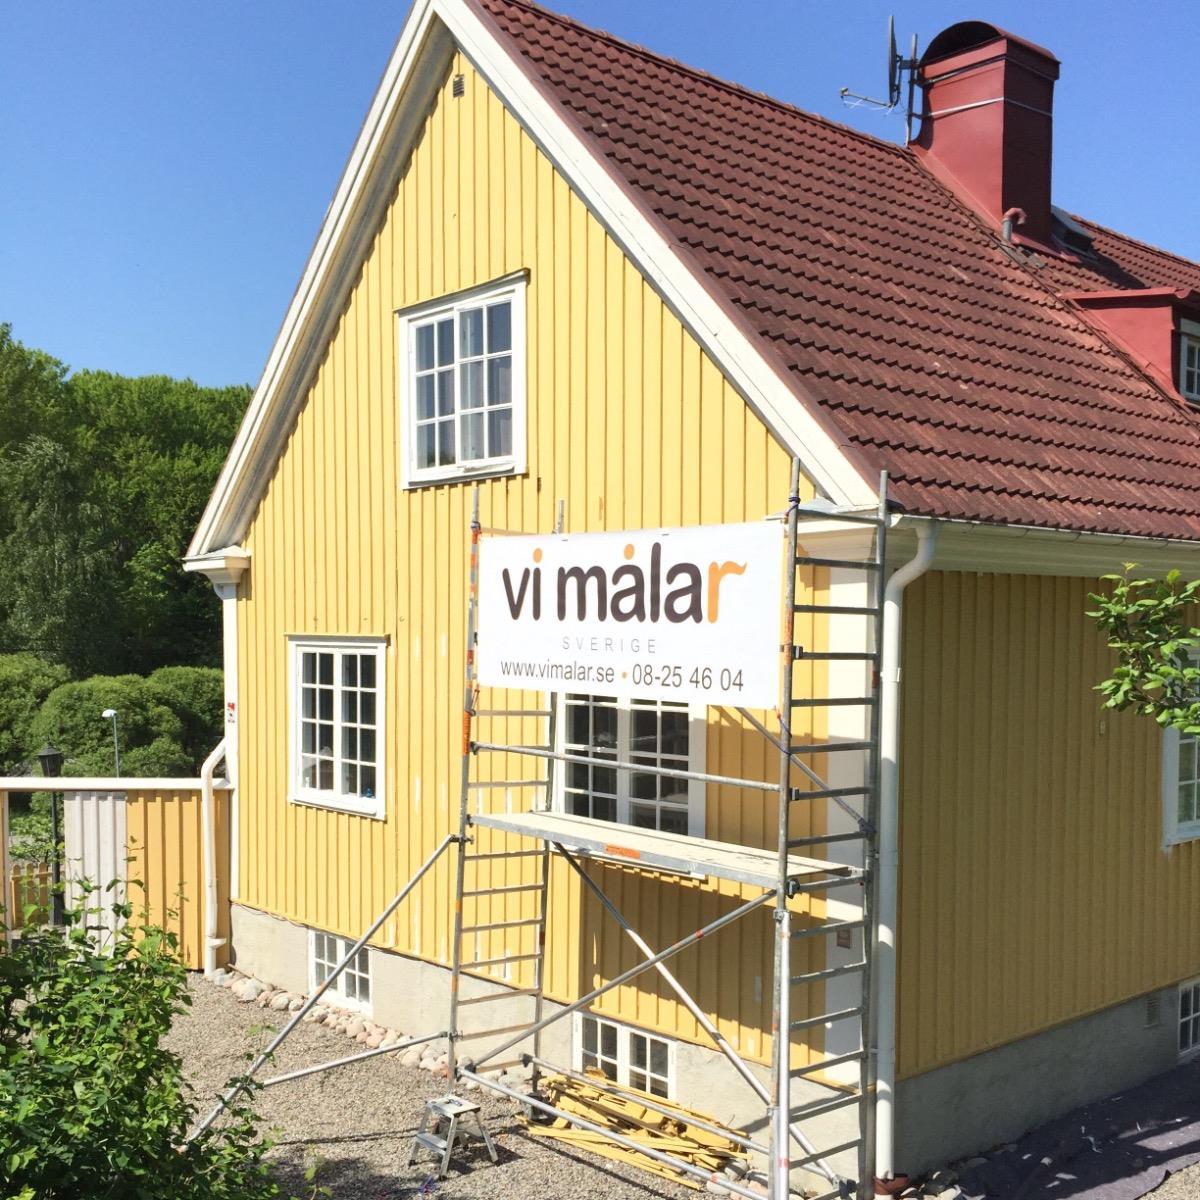 Case Study:Vi Målar Sverige AB – Painting Firm